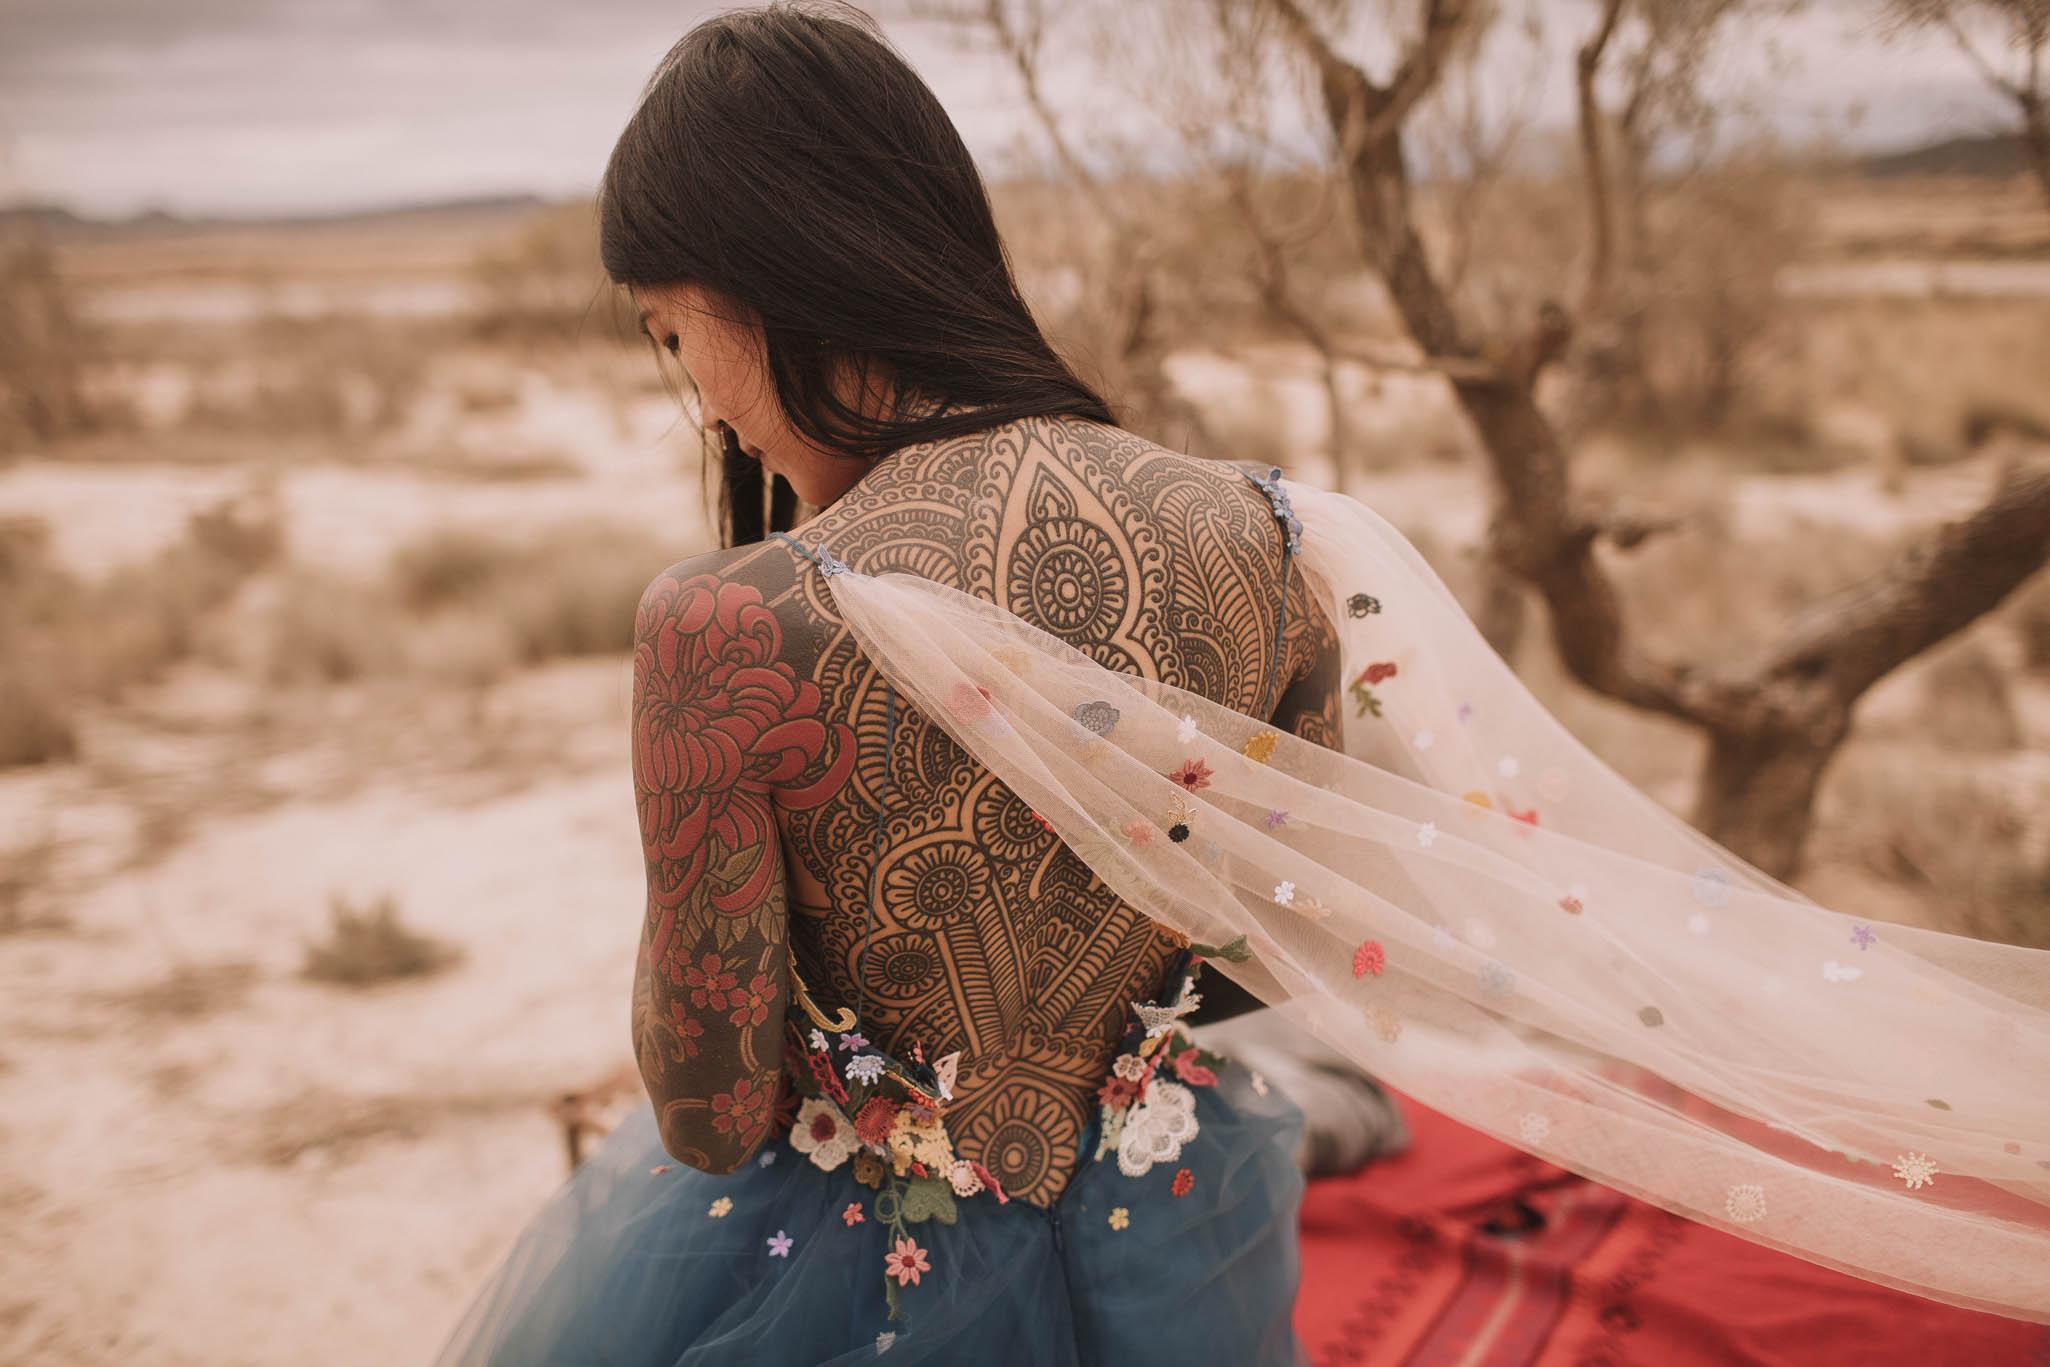 Spain-wedding-photographer-bardenas-reales-jeremy-boyer-photographe-mariage-bordeaux-floral-wedding-dress-robe-59.jpg